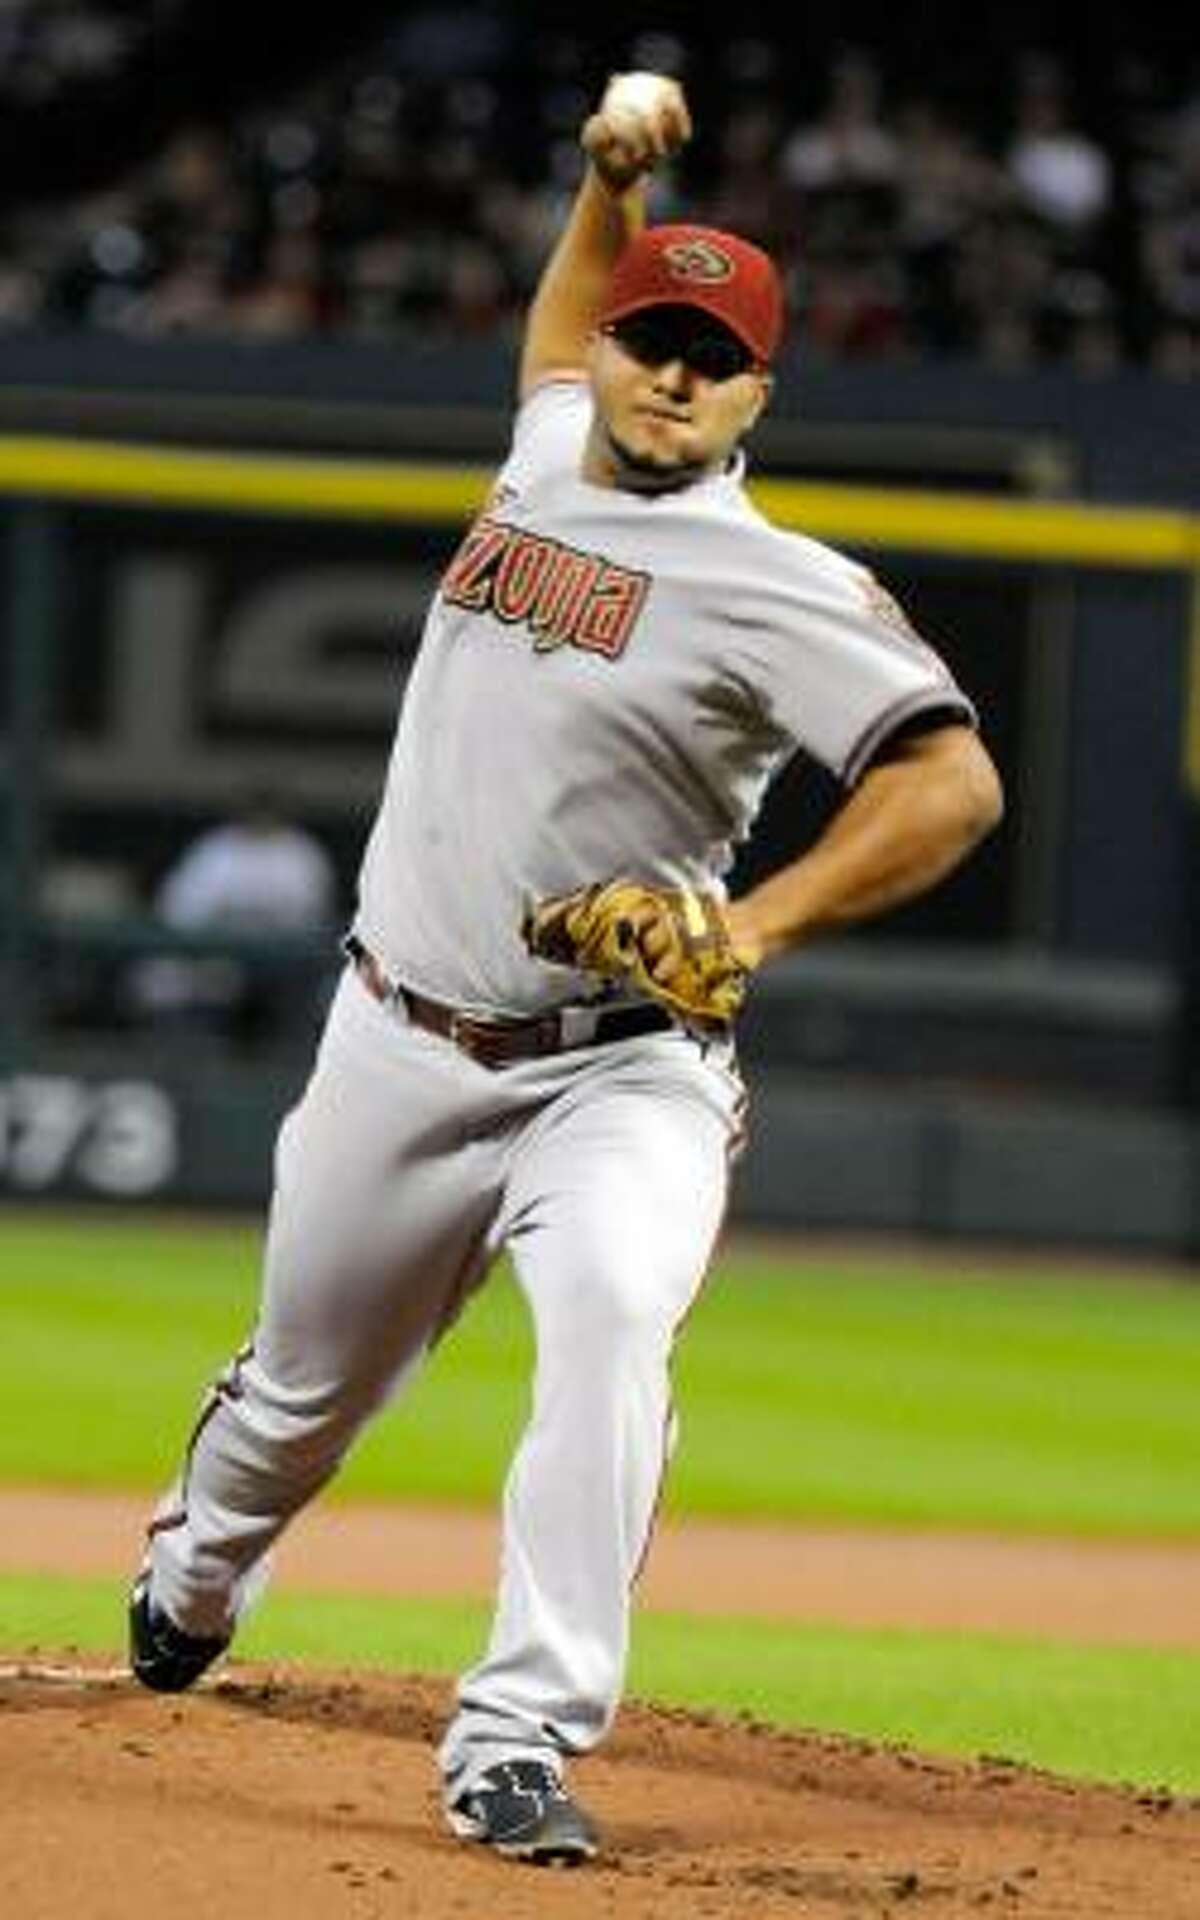 Diamondbacks' Yusmeiro Petit delivers a pitch against the Astros.